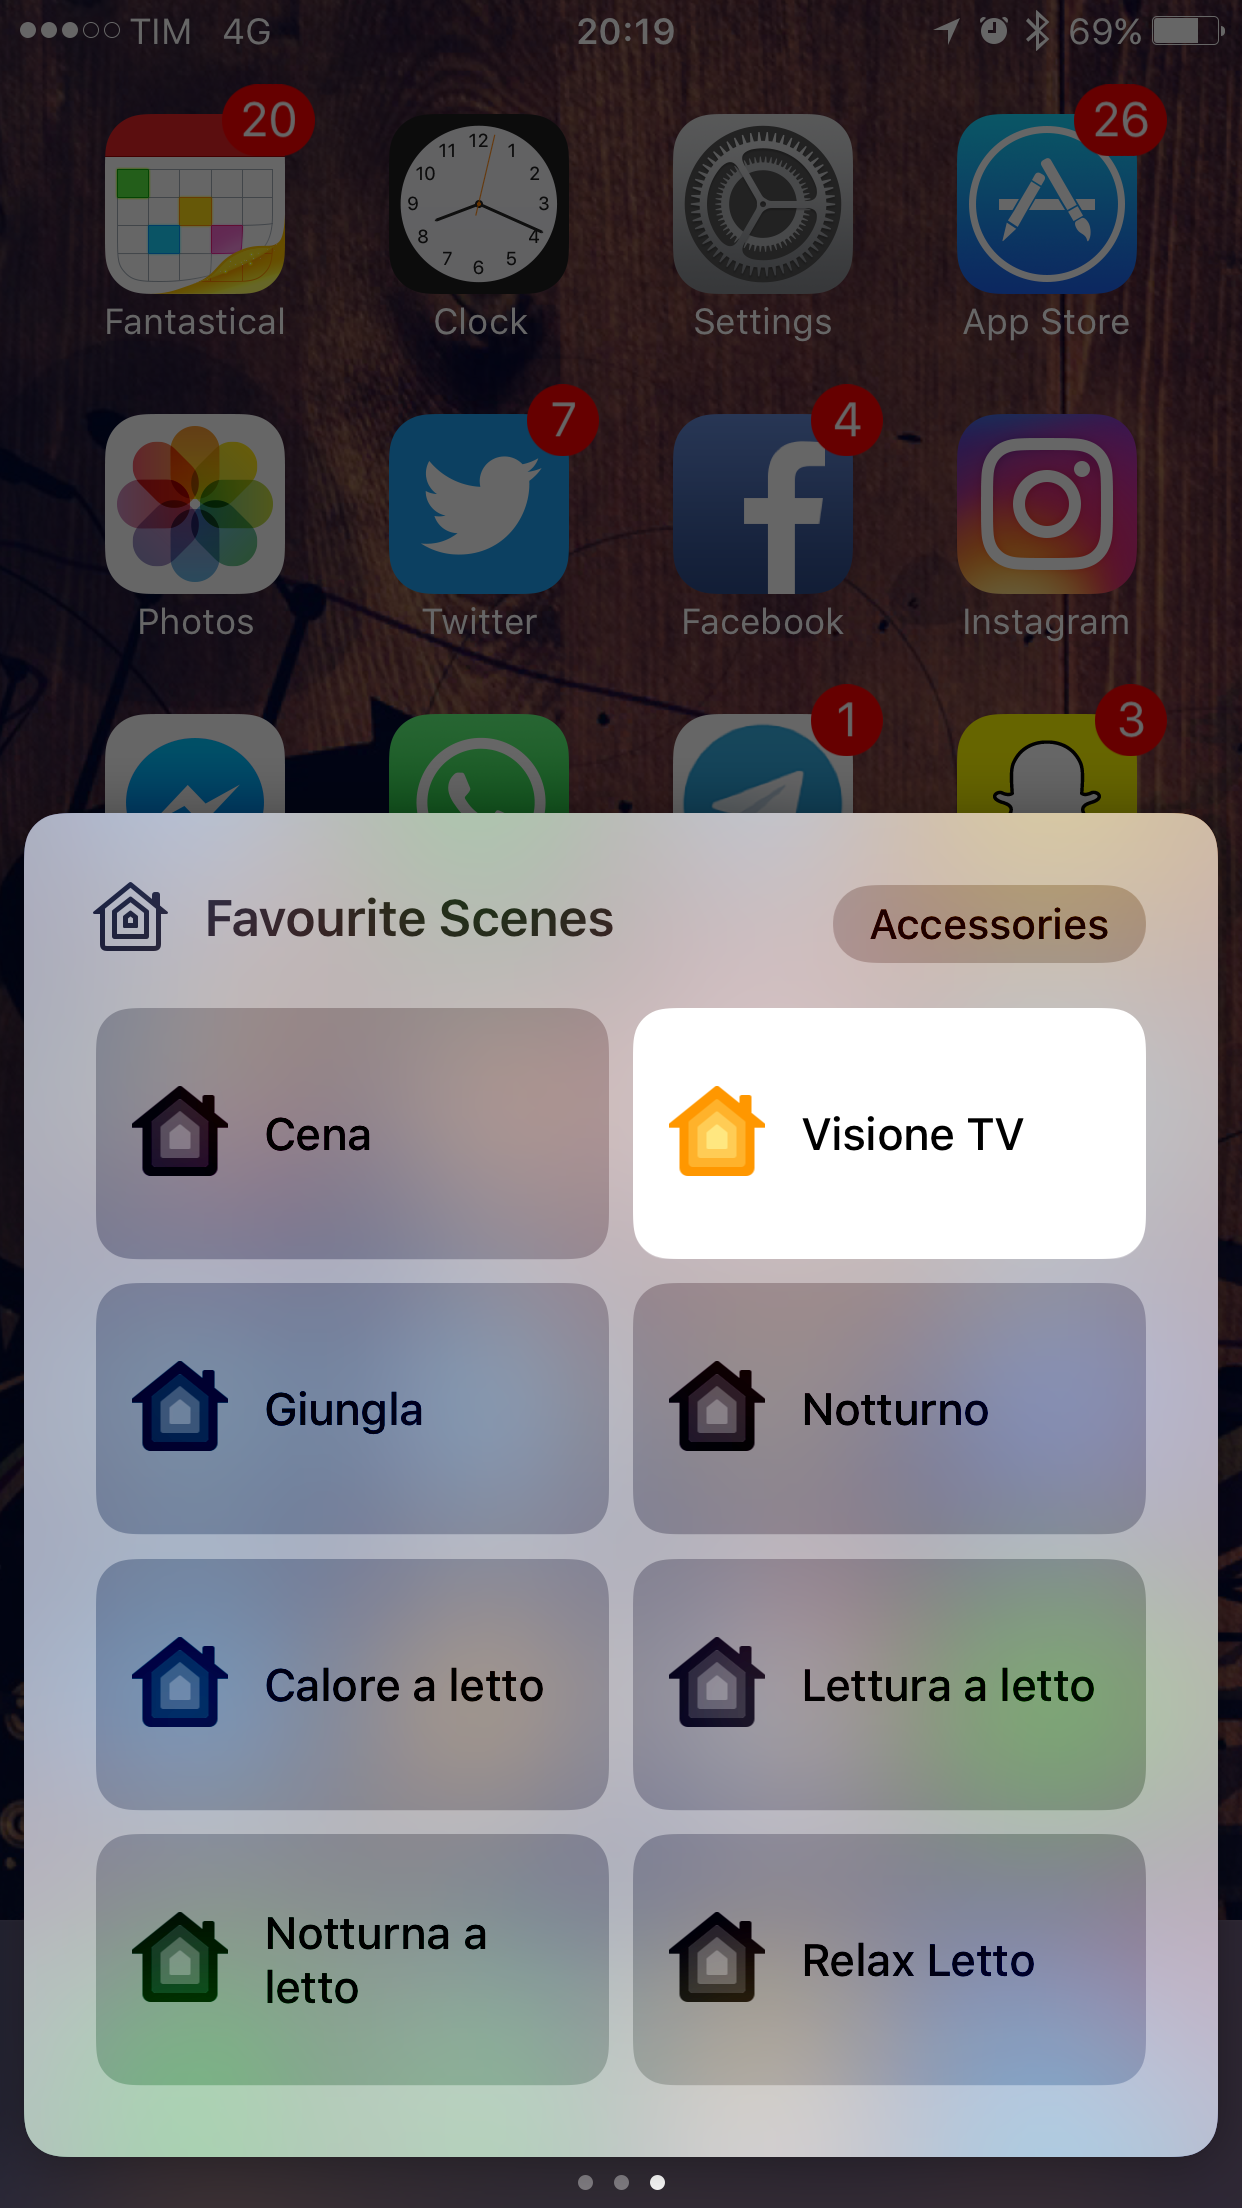 controllo casa con iphone